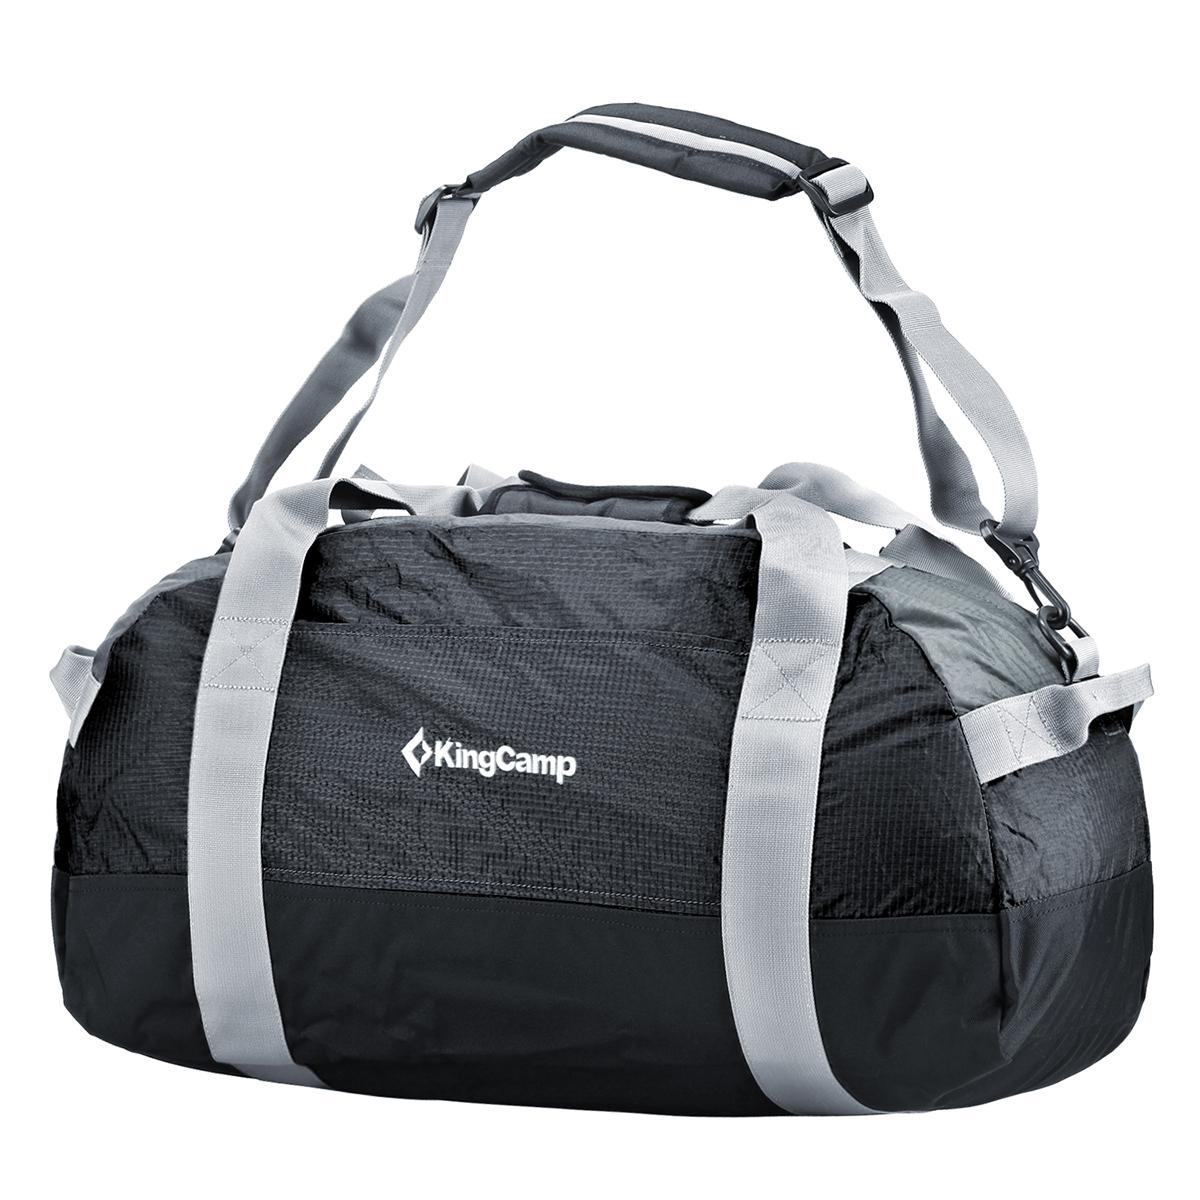 Сумка-баул для путешествий AIRPORTER, цвет: черный. 120 лУТ-000058064АIRPORTER 120 сумка-баул для путешествий, шопинга в чехле Артикул KB4307 Объем: 120 литров Размеры: 90 х 38 х 36 см Упаковка: 28 х 17 х 10 см Материал: нейлон 210D Double RipStop PU from Korea, полиэстер